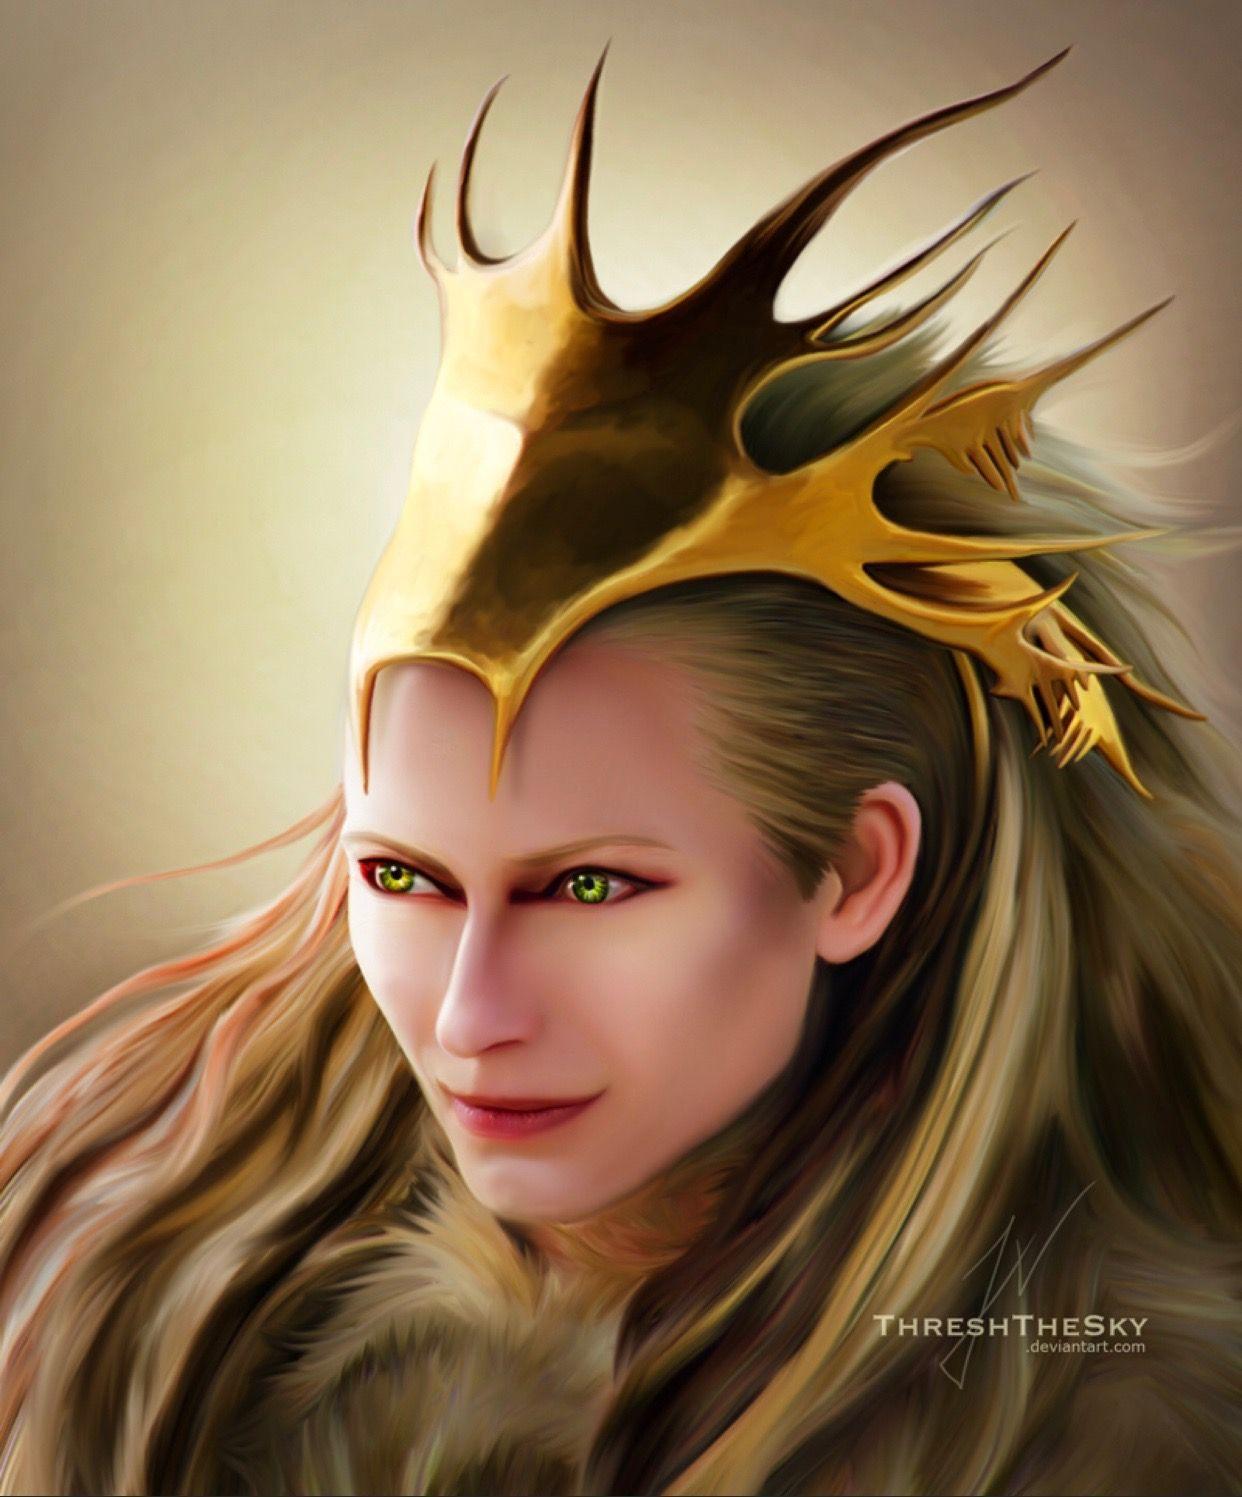 ThreshTheSky Disney Queen Jadis of Narnia Narnia